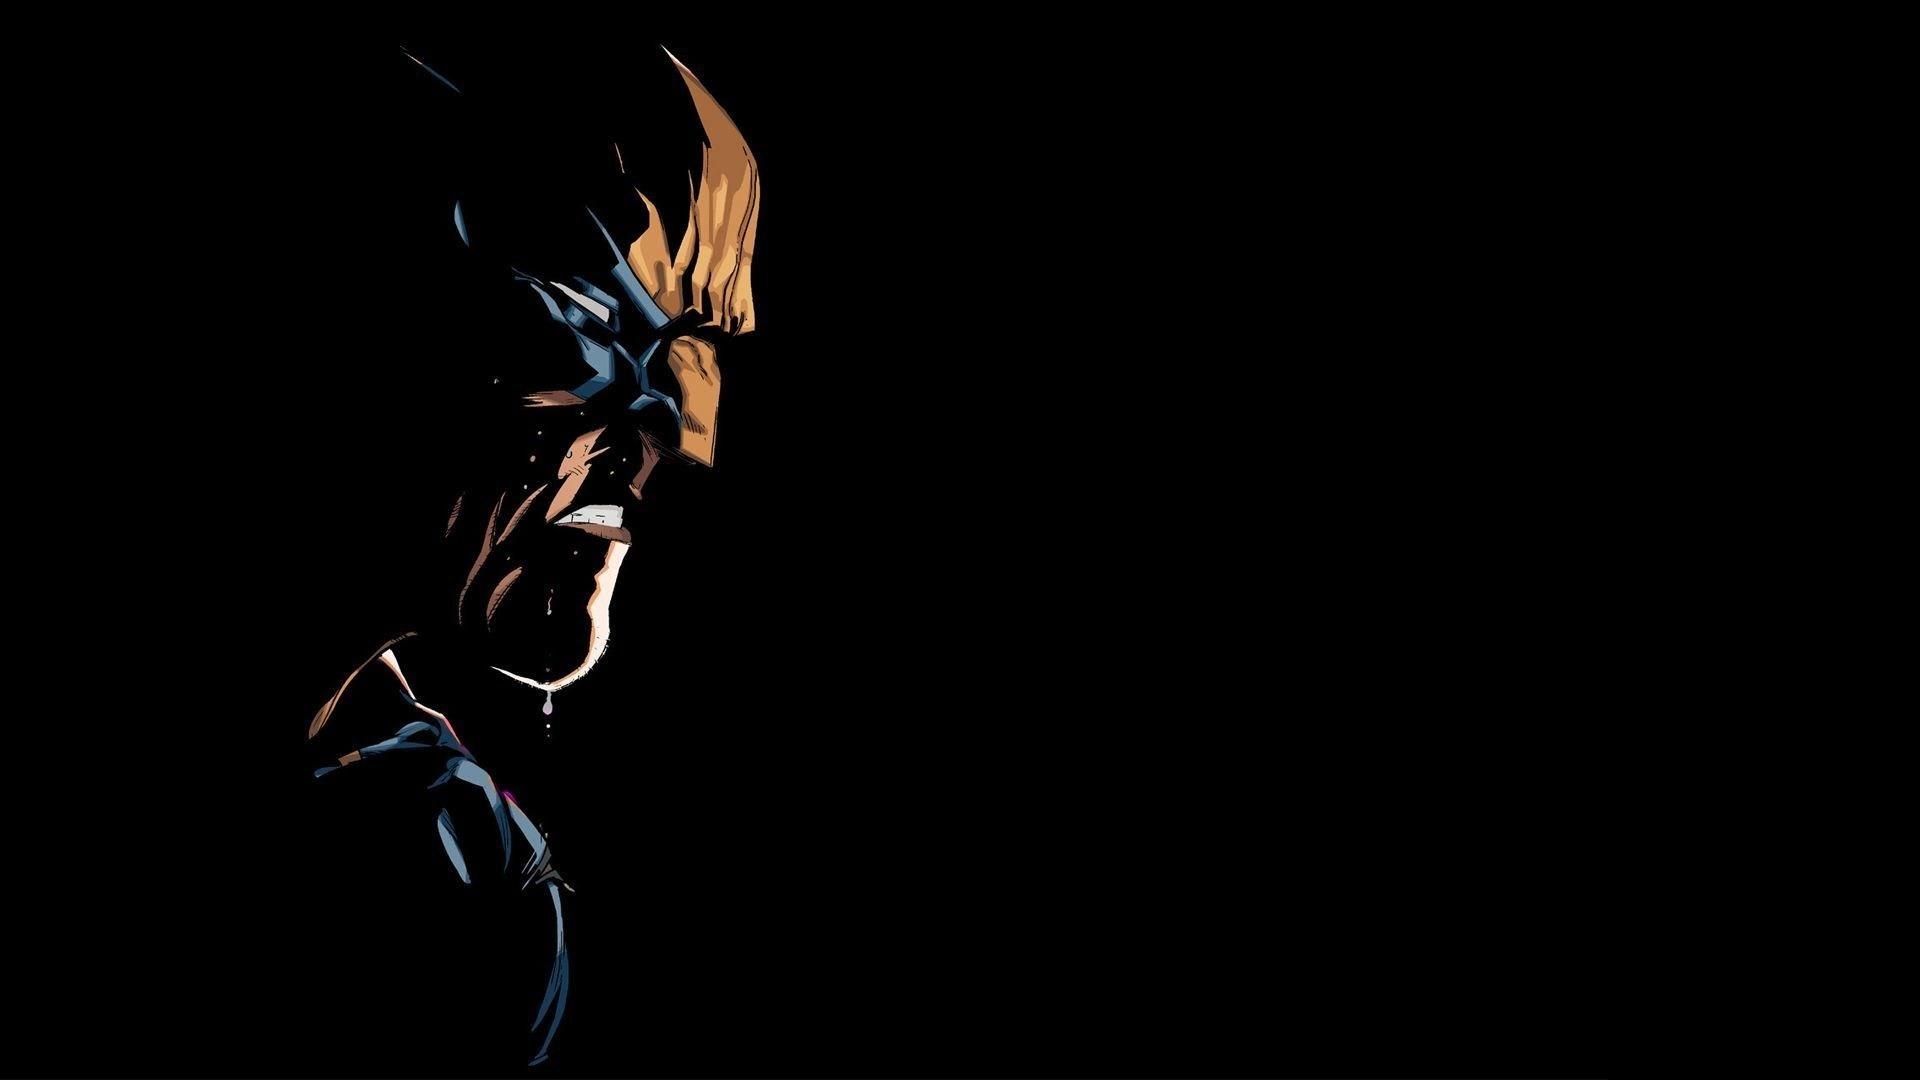 1920x1080 Comics Wolverine X Men Cyclops Marvel Rogue Character Wallpapers HD Desktop And Mobile Backgrounds